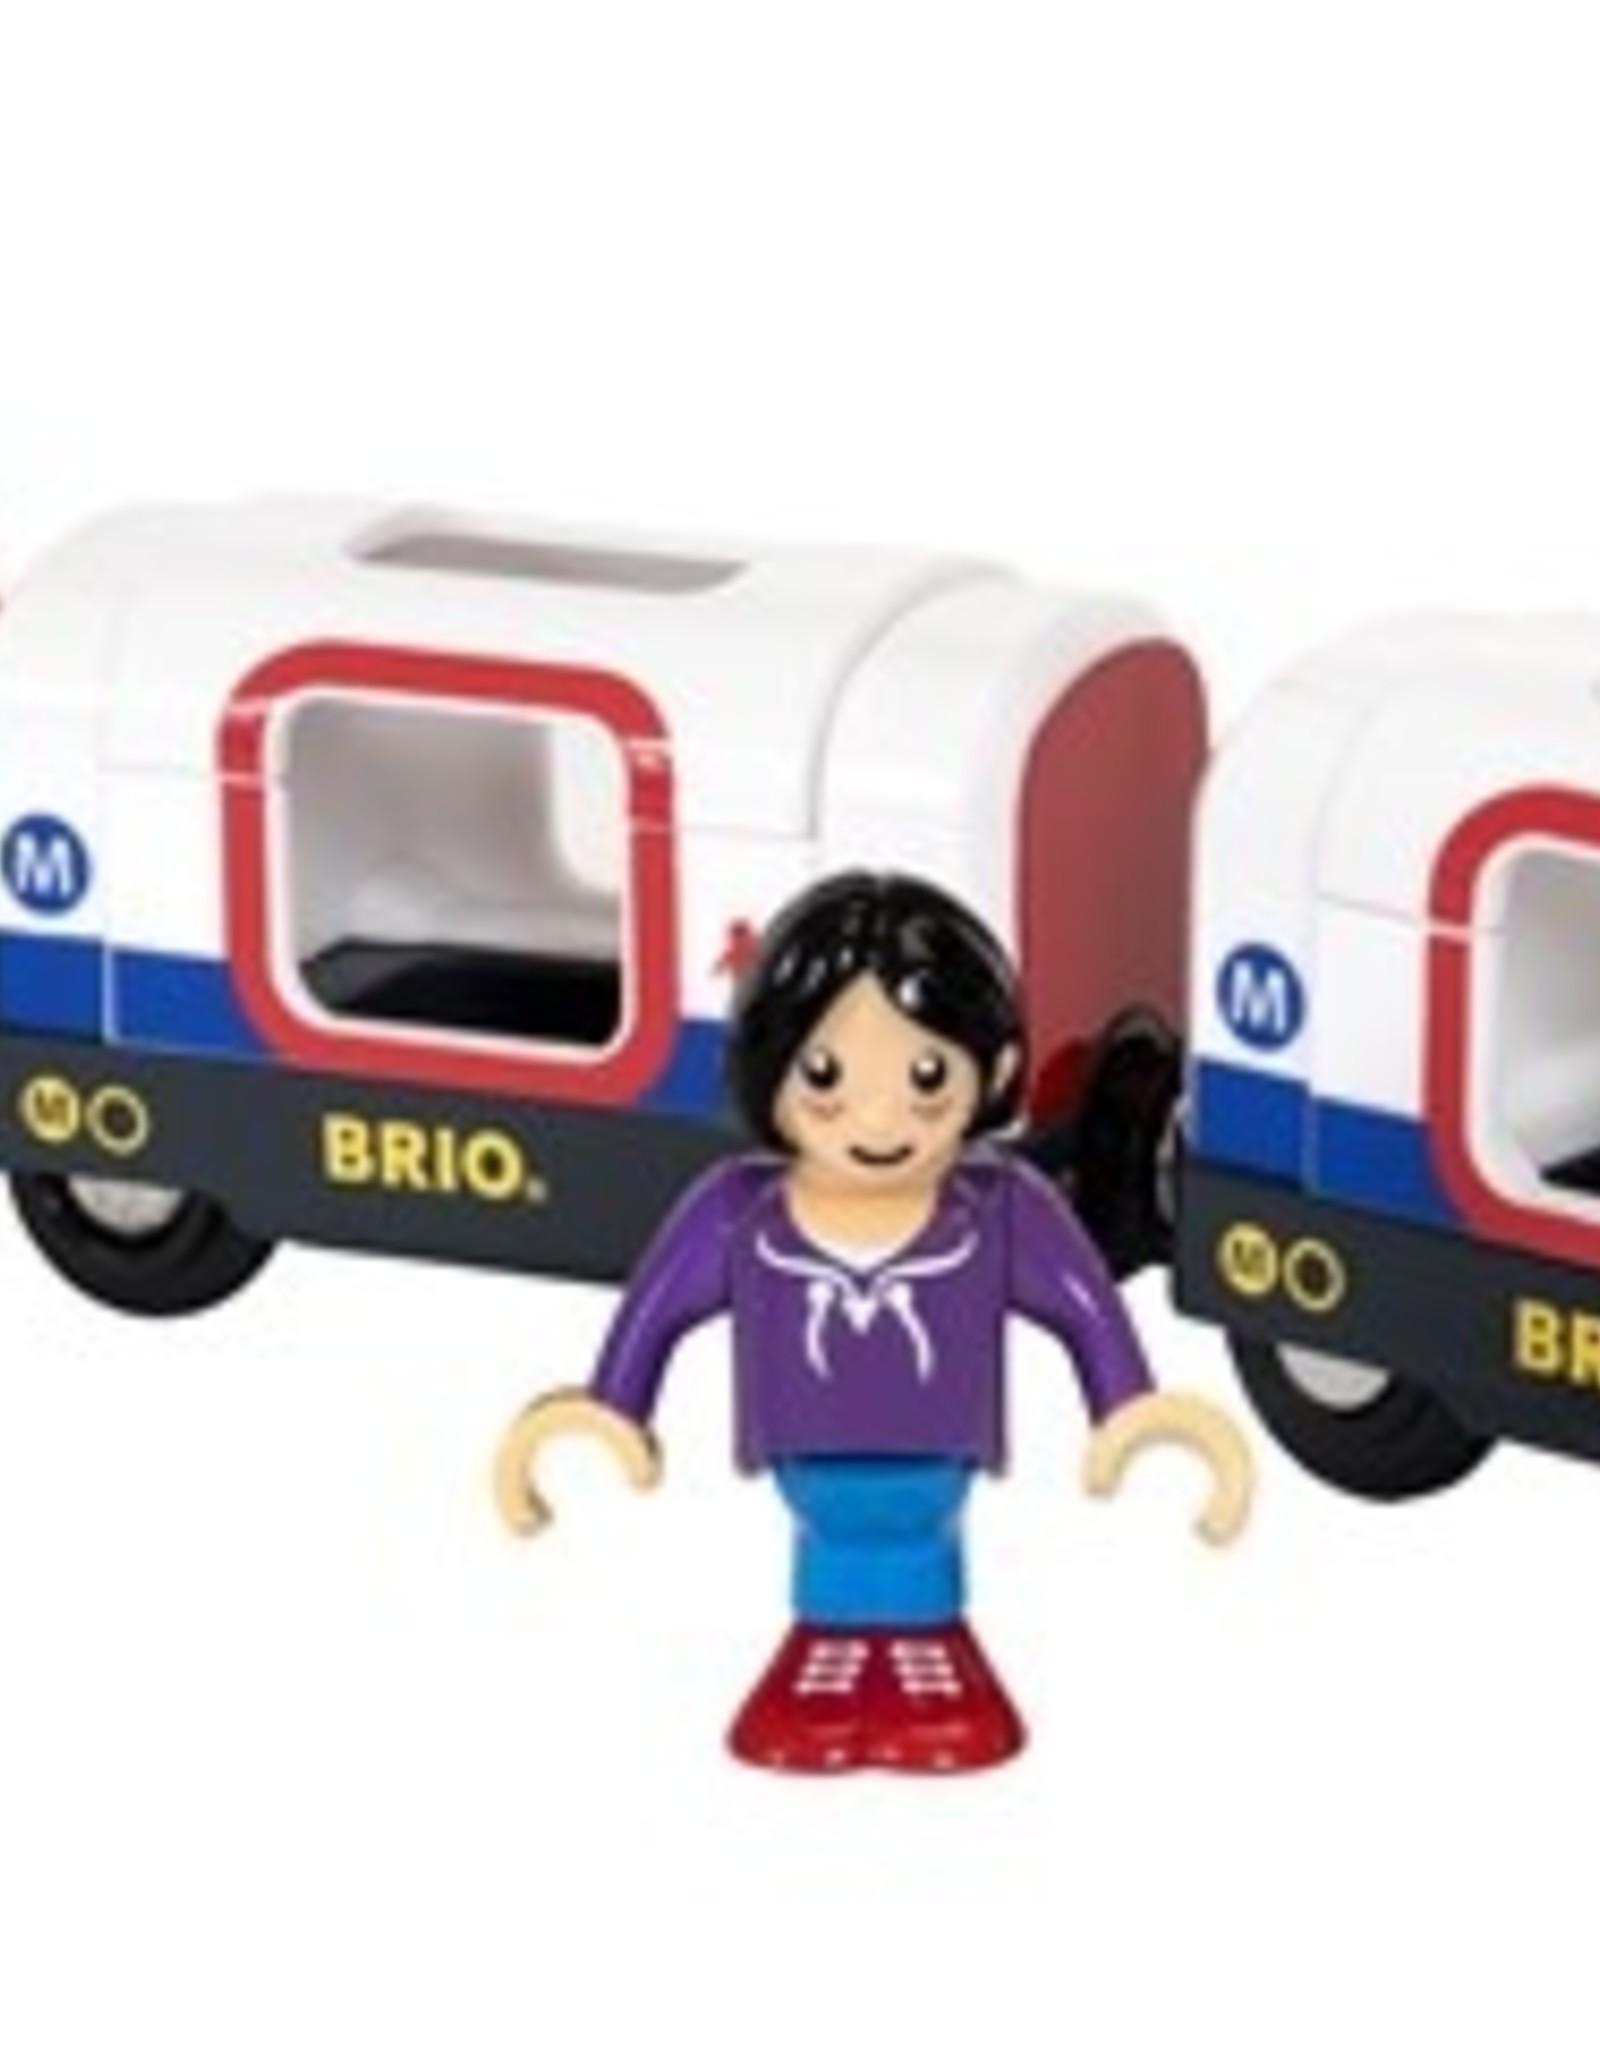 Brio Metrotrein